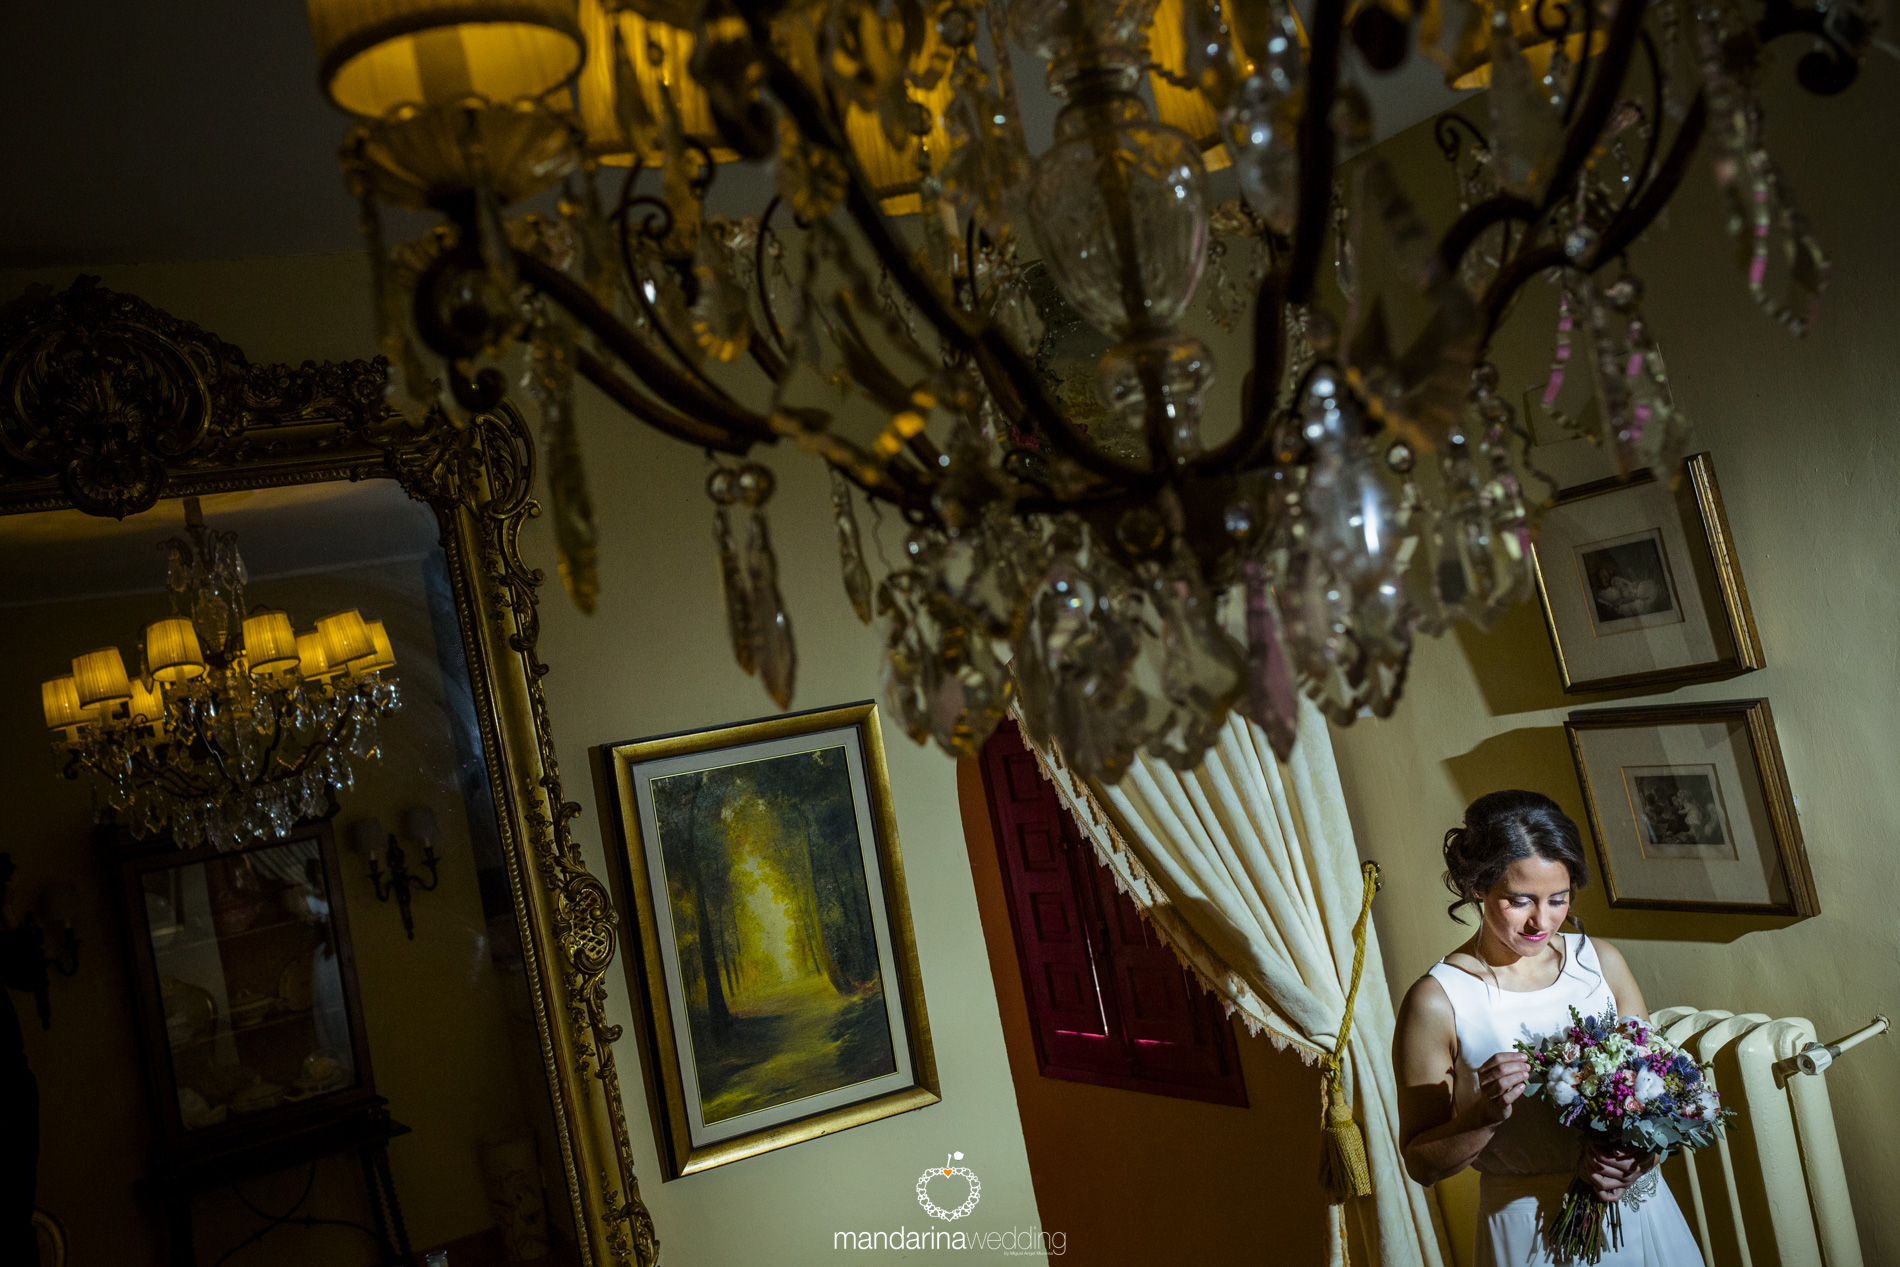 mandarina wedding, fotografos de boda, fotografo boda soria, fotografo boda barcelona, fotografo boda Madrid, fotógrafo boda lerida_30